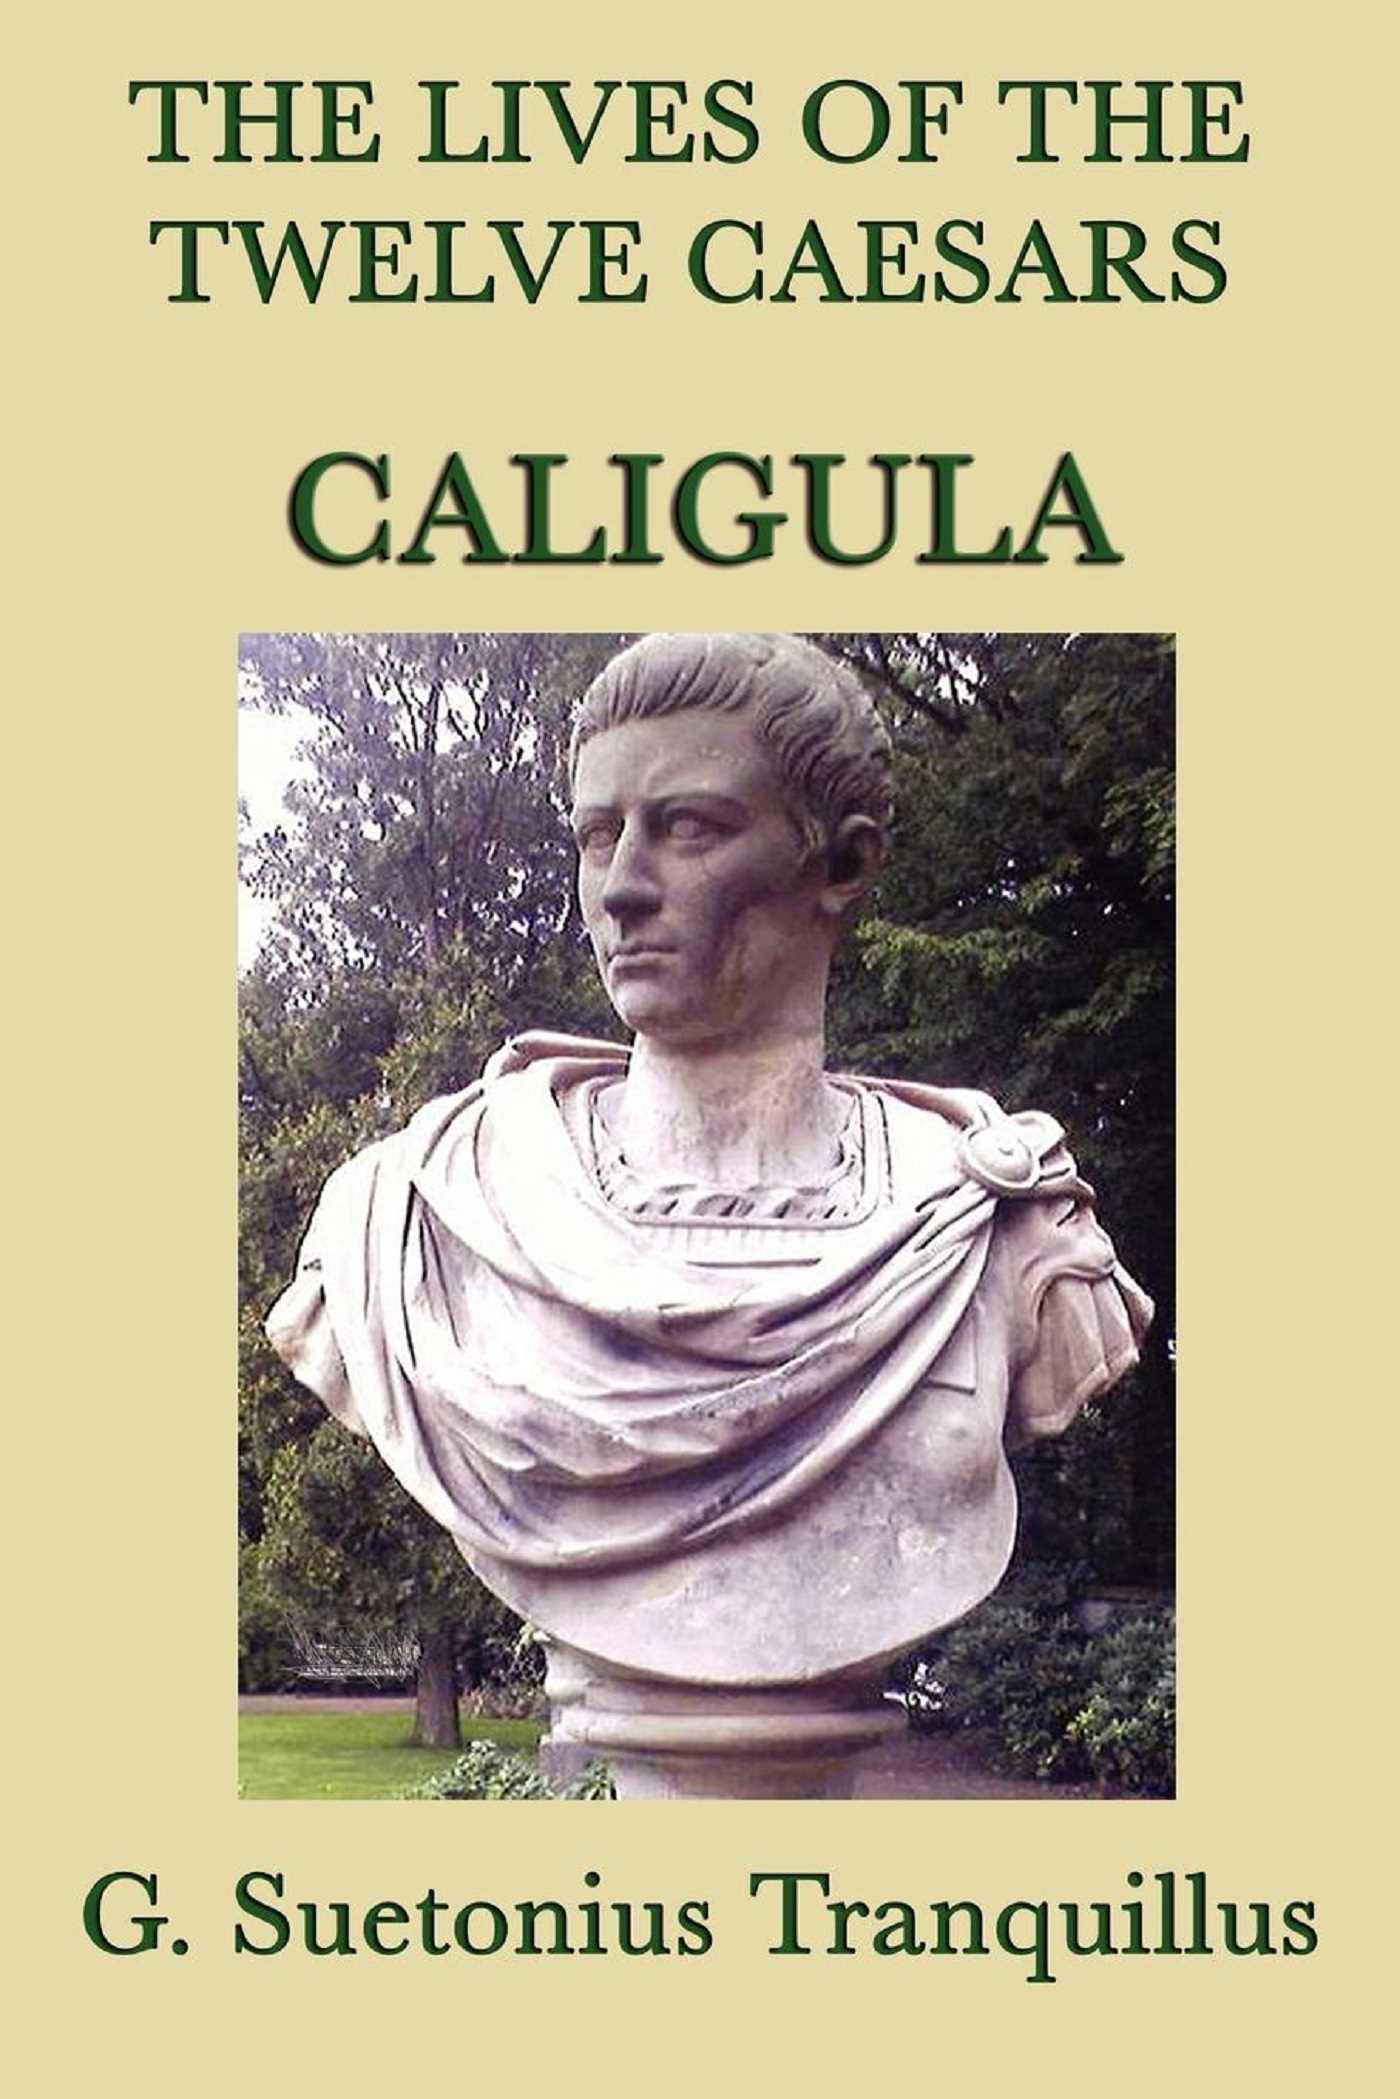 The Lives Of Twelve Caesars Caligula 9781625580009 Hr